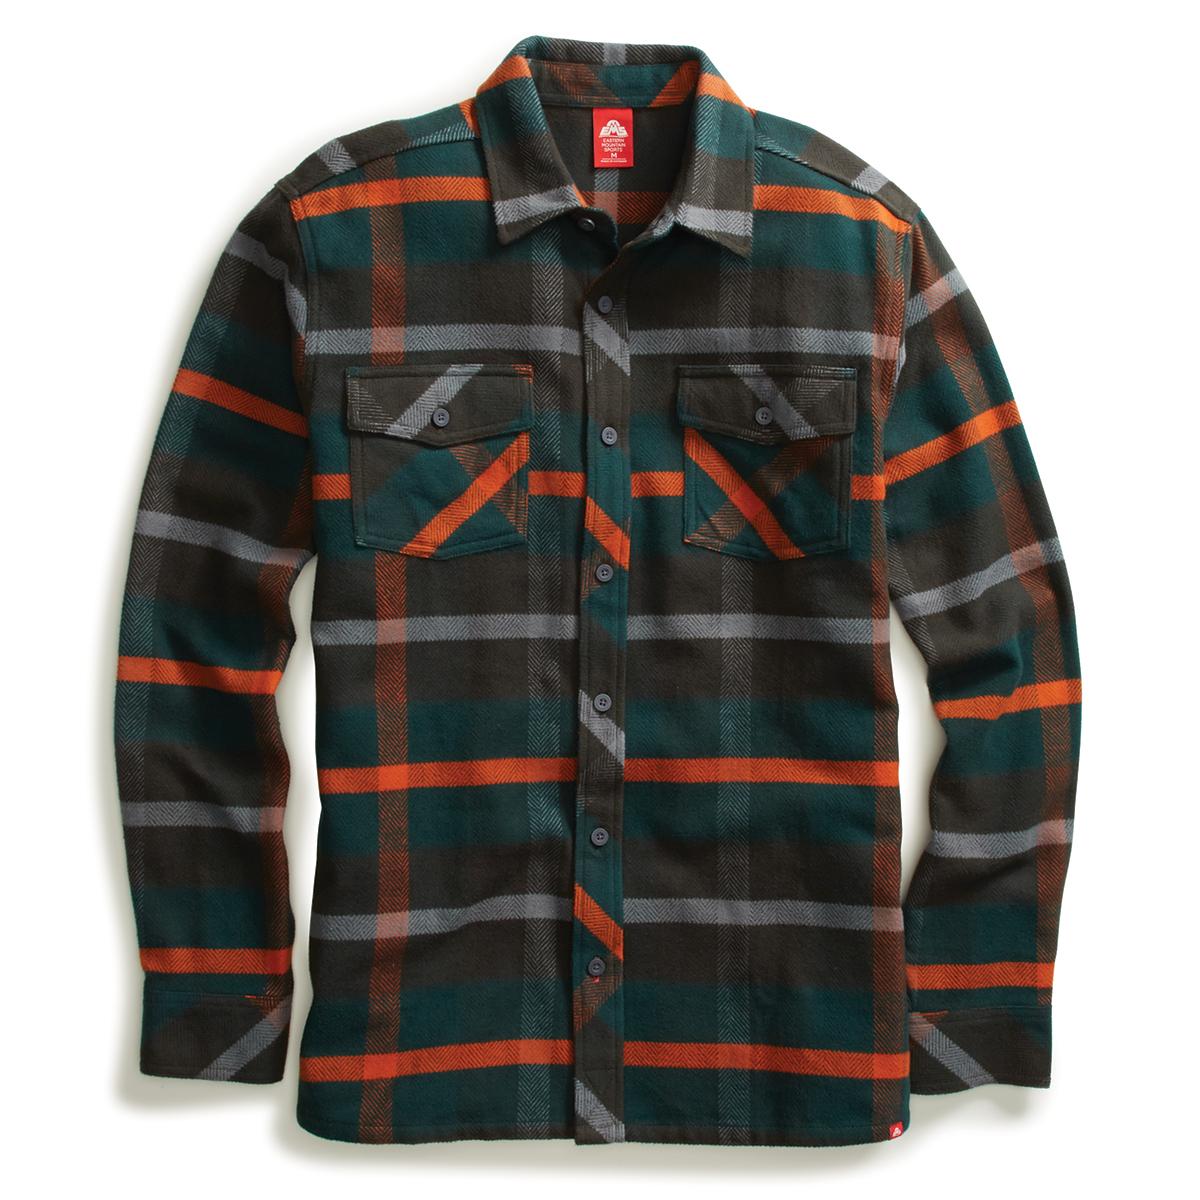 Ems Men's Cabin Flannel Long-Sleeve Shirt - Green, S